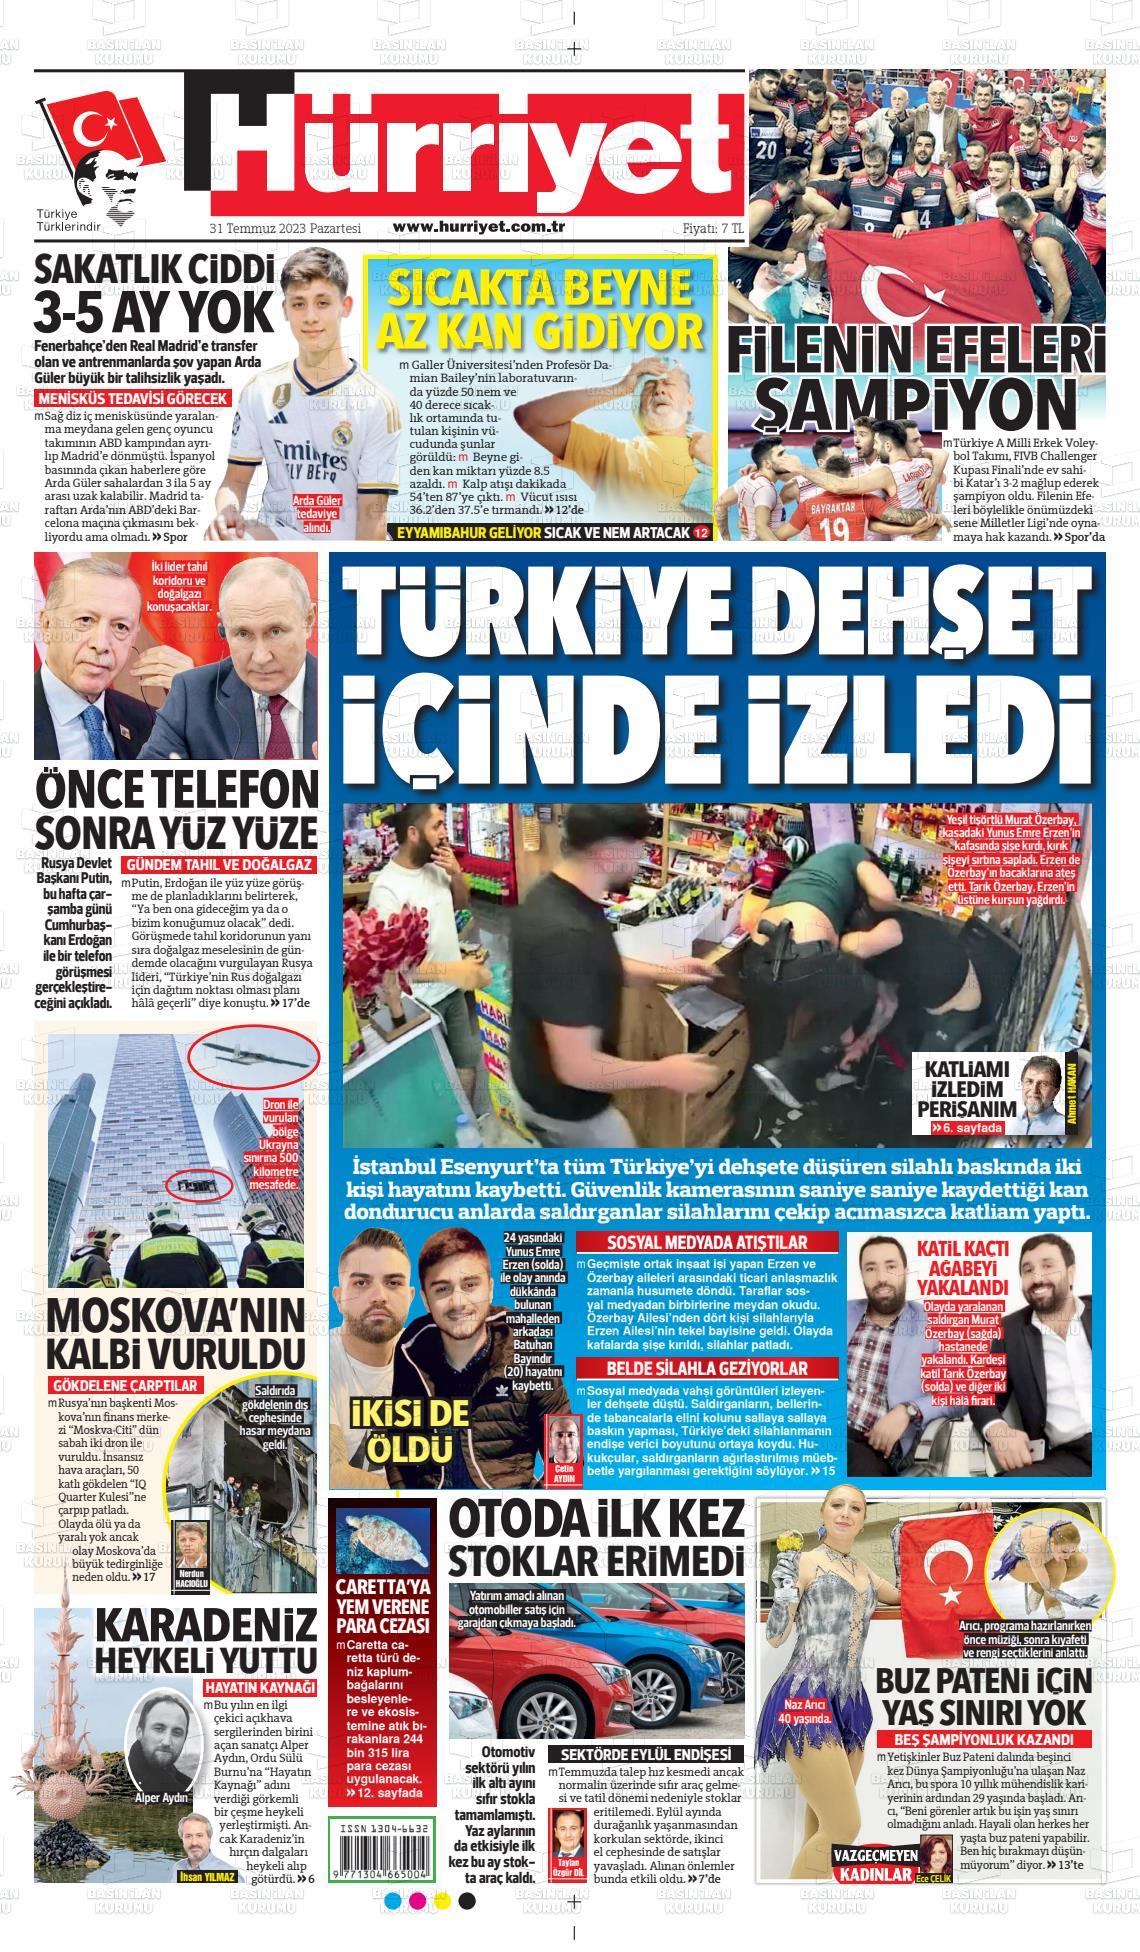 25 Ocak 2020, Cumartesi hurriyet Gazetesi